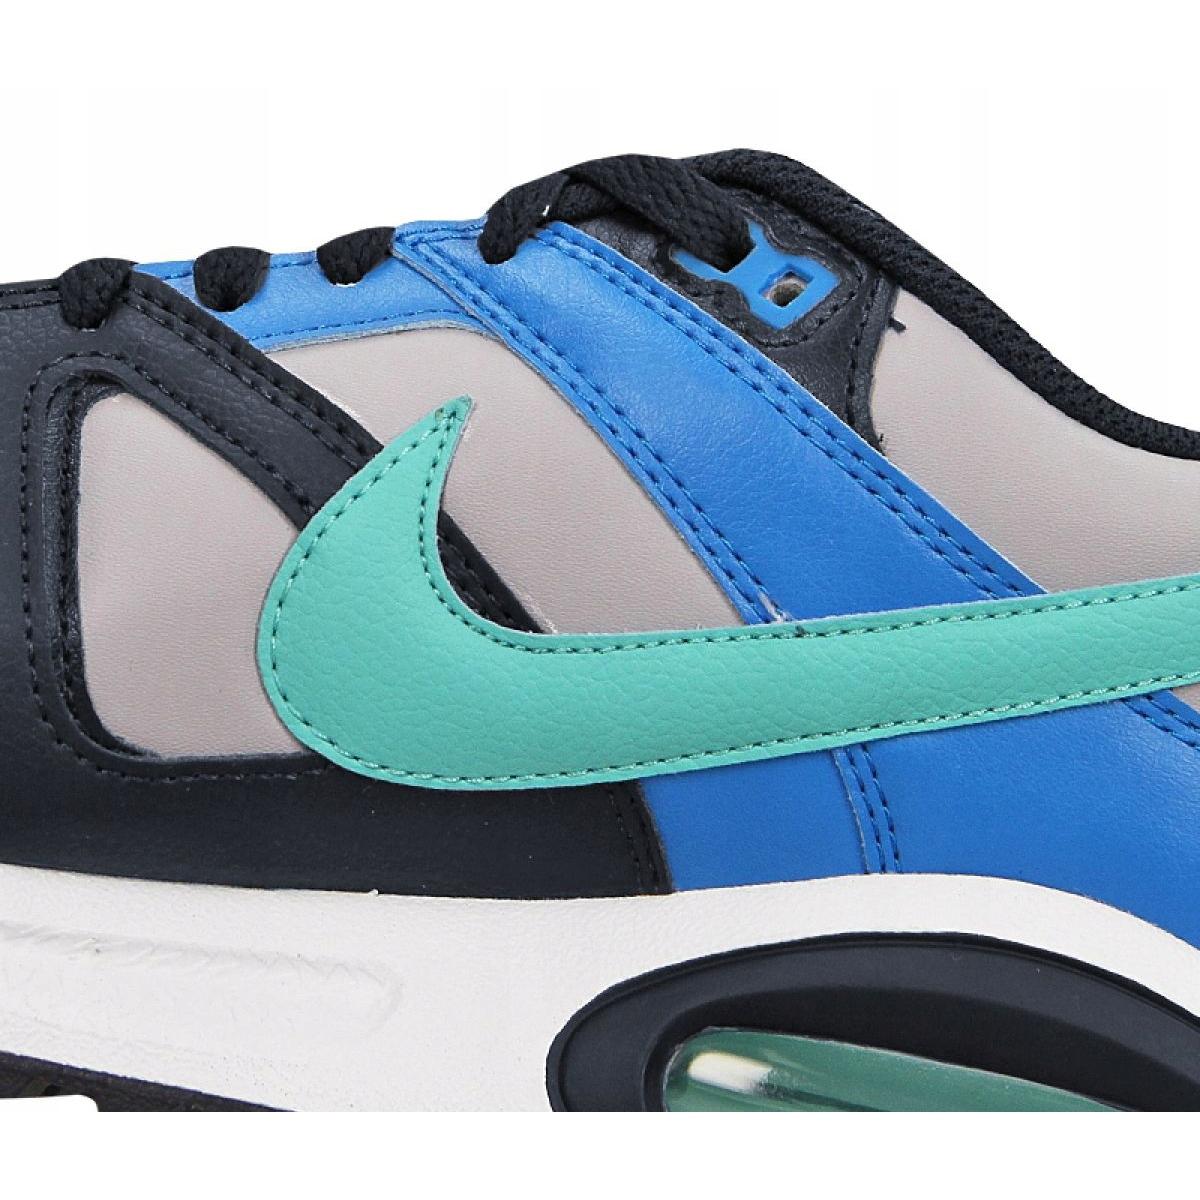 Sapatilhas Nike Air Max Command M 629993 050 multicolorido